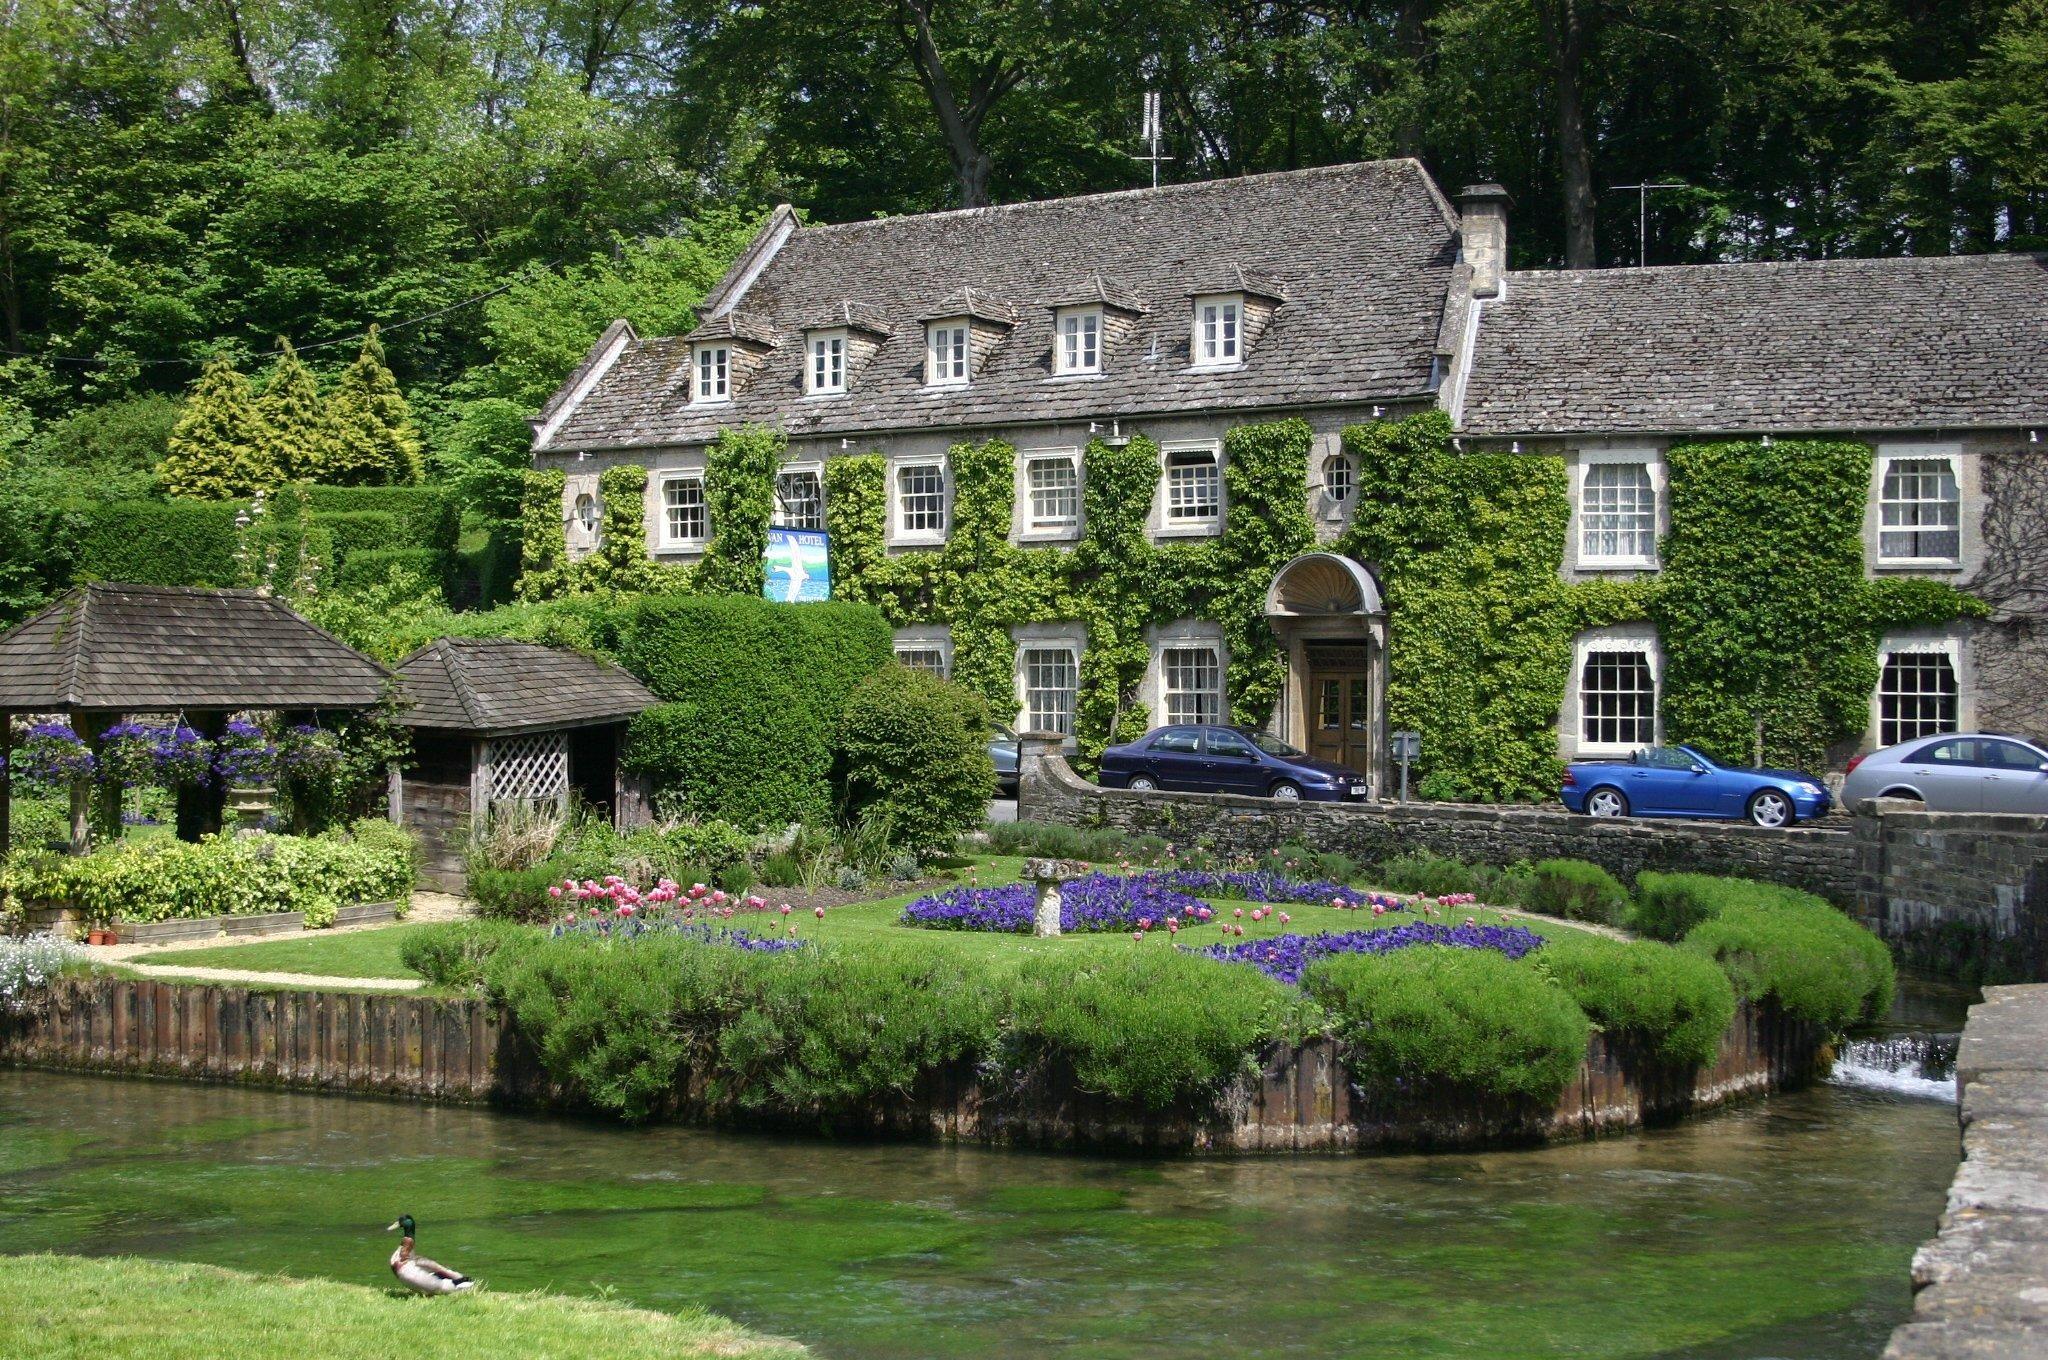 Swan Hotel Bibury England Best Place For A Honeymoon